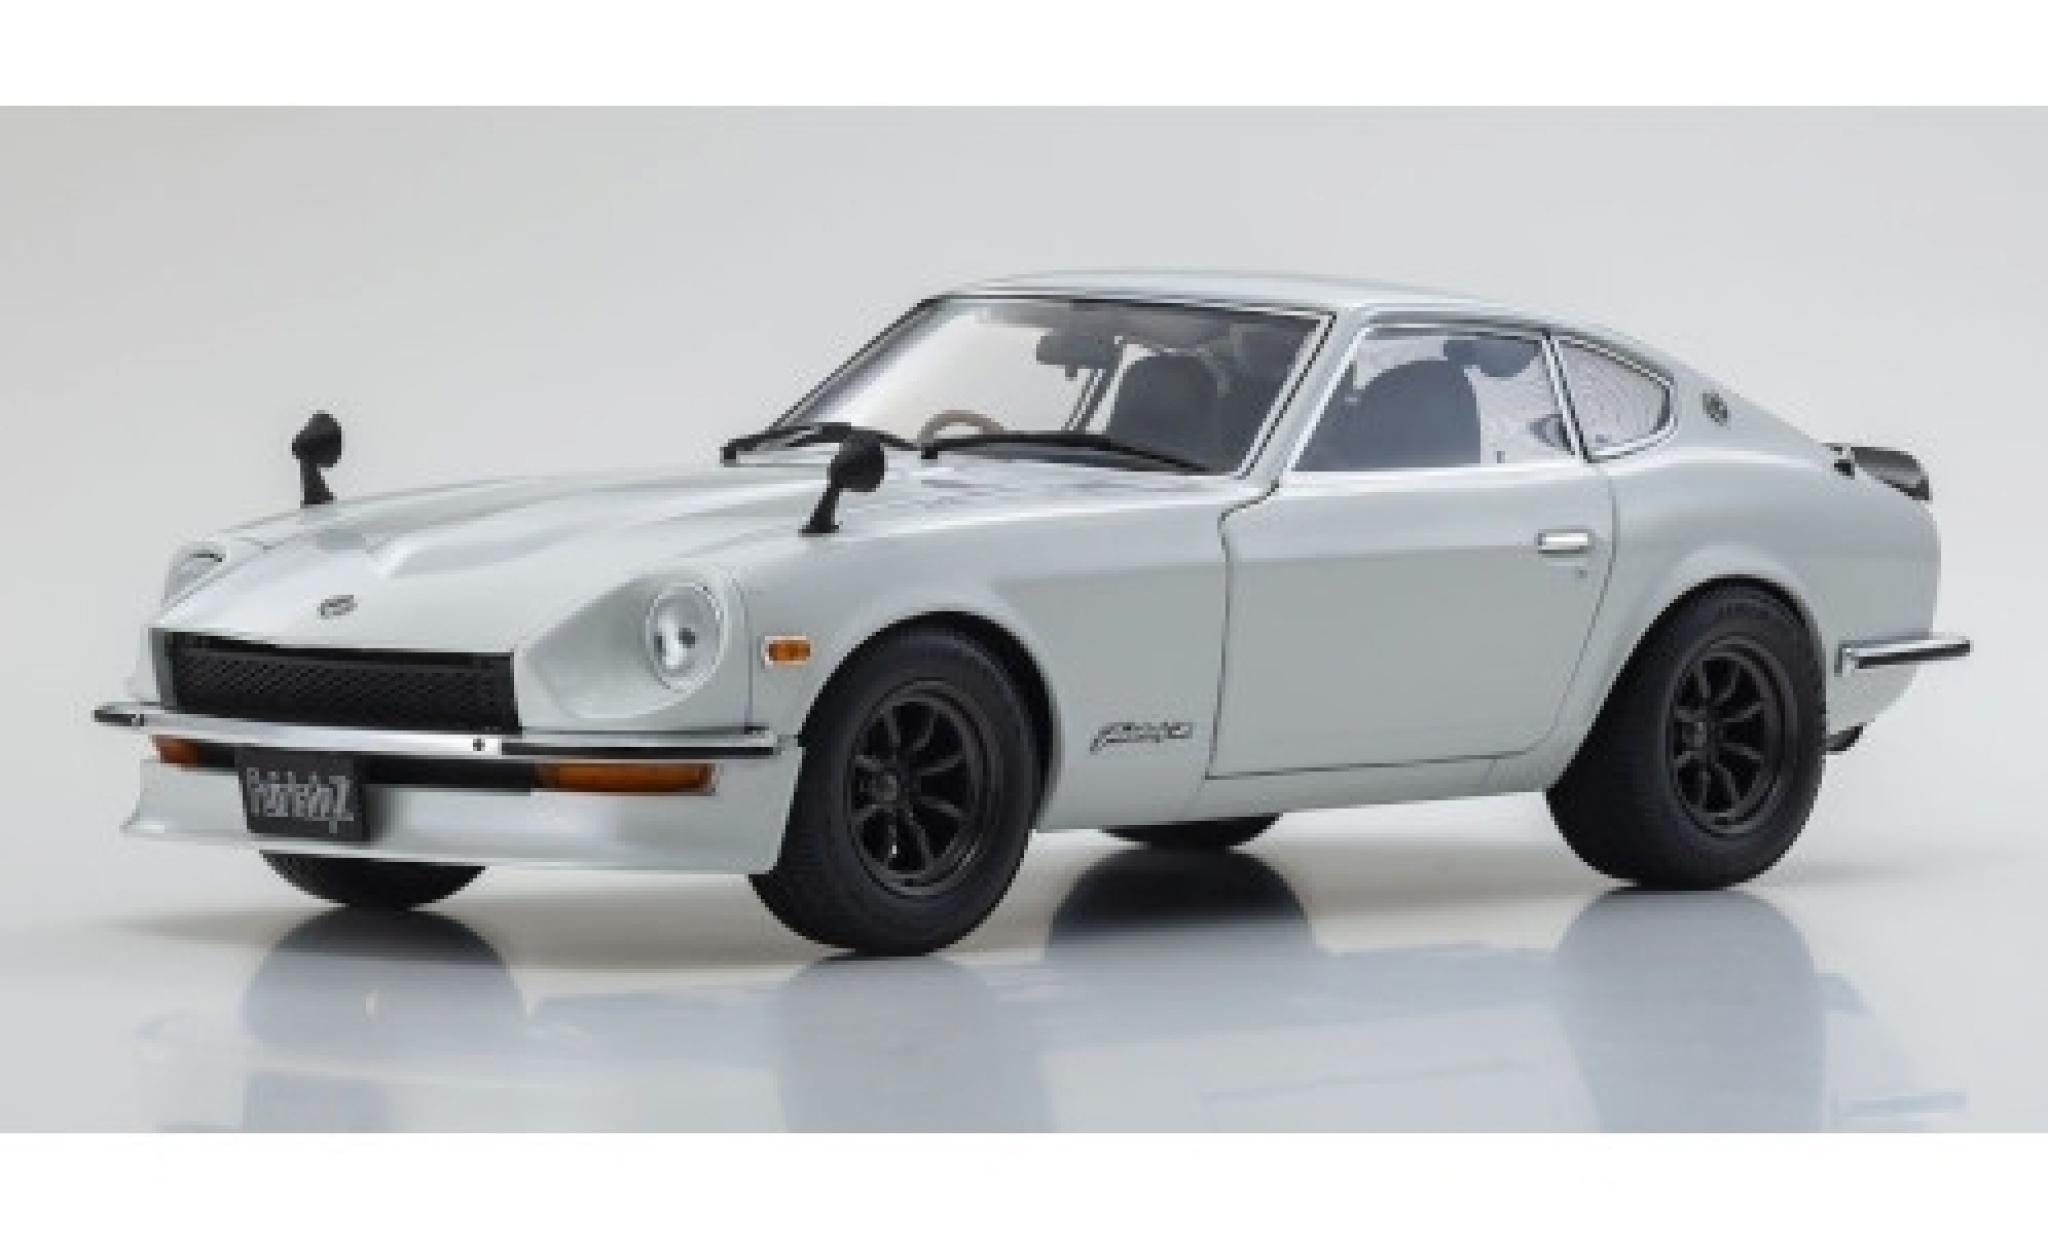 Nissan Fairlady Z 1/18 Kyosho (S30) blanche RHD 1970